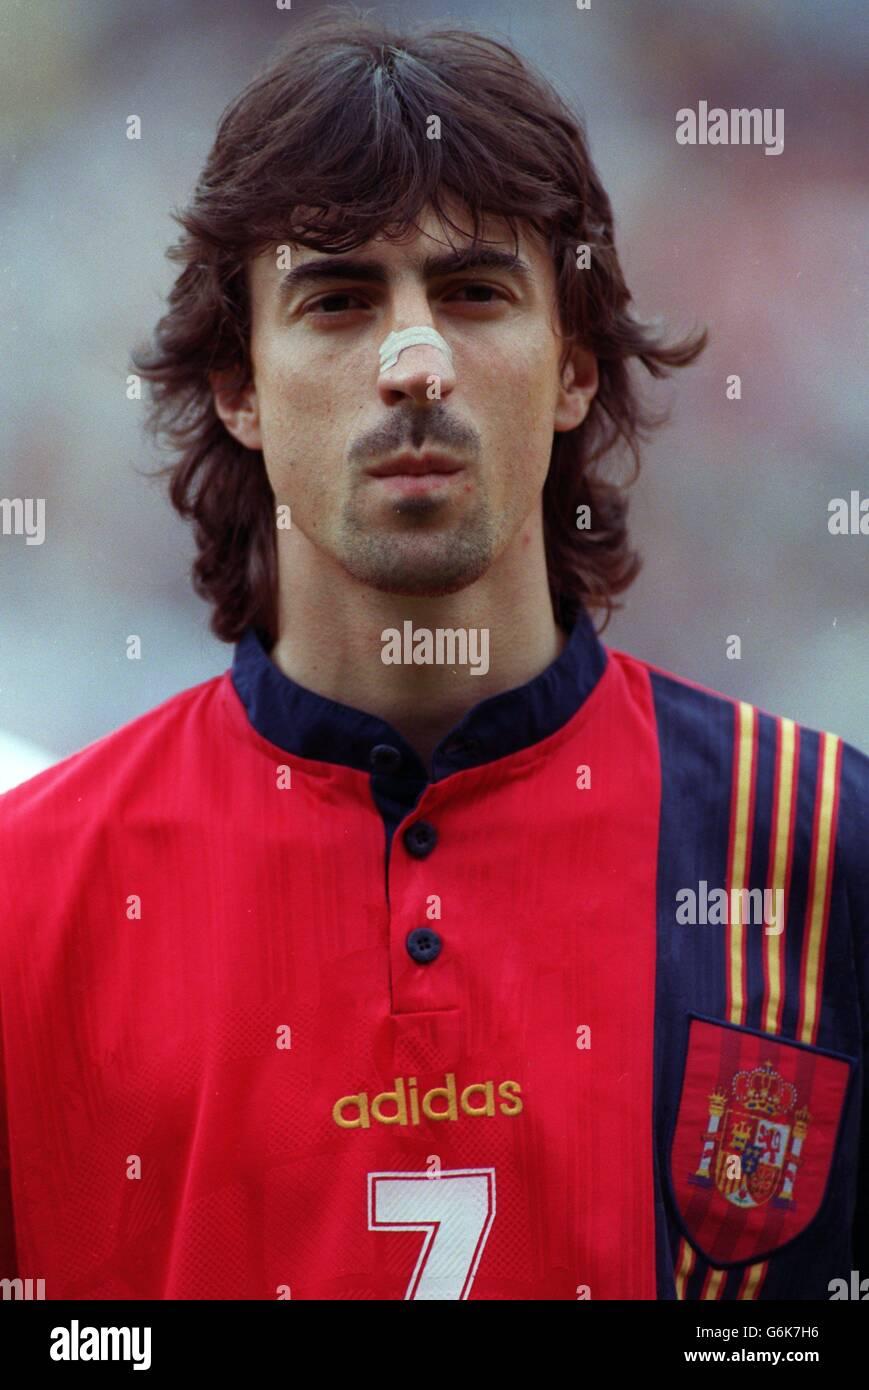 Fußball. 96 Euro. Rumänien / Spanien. Jose Emilio Amavisca, Spanien Stockfoto